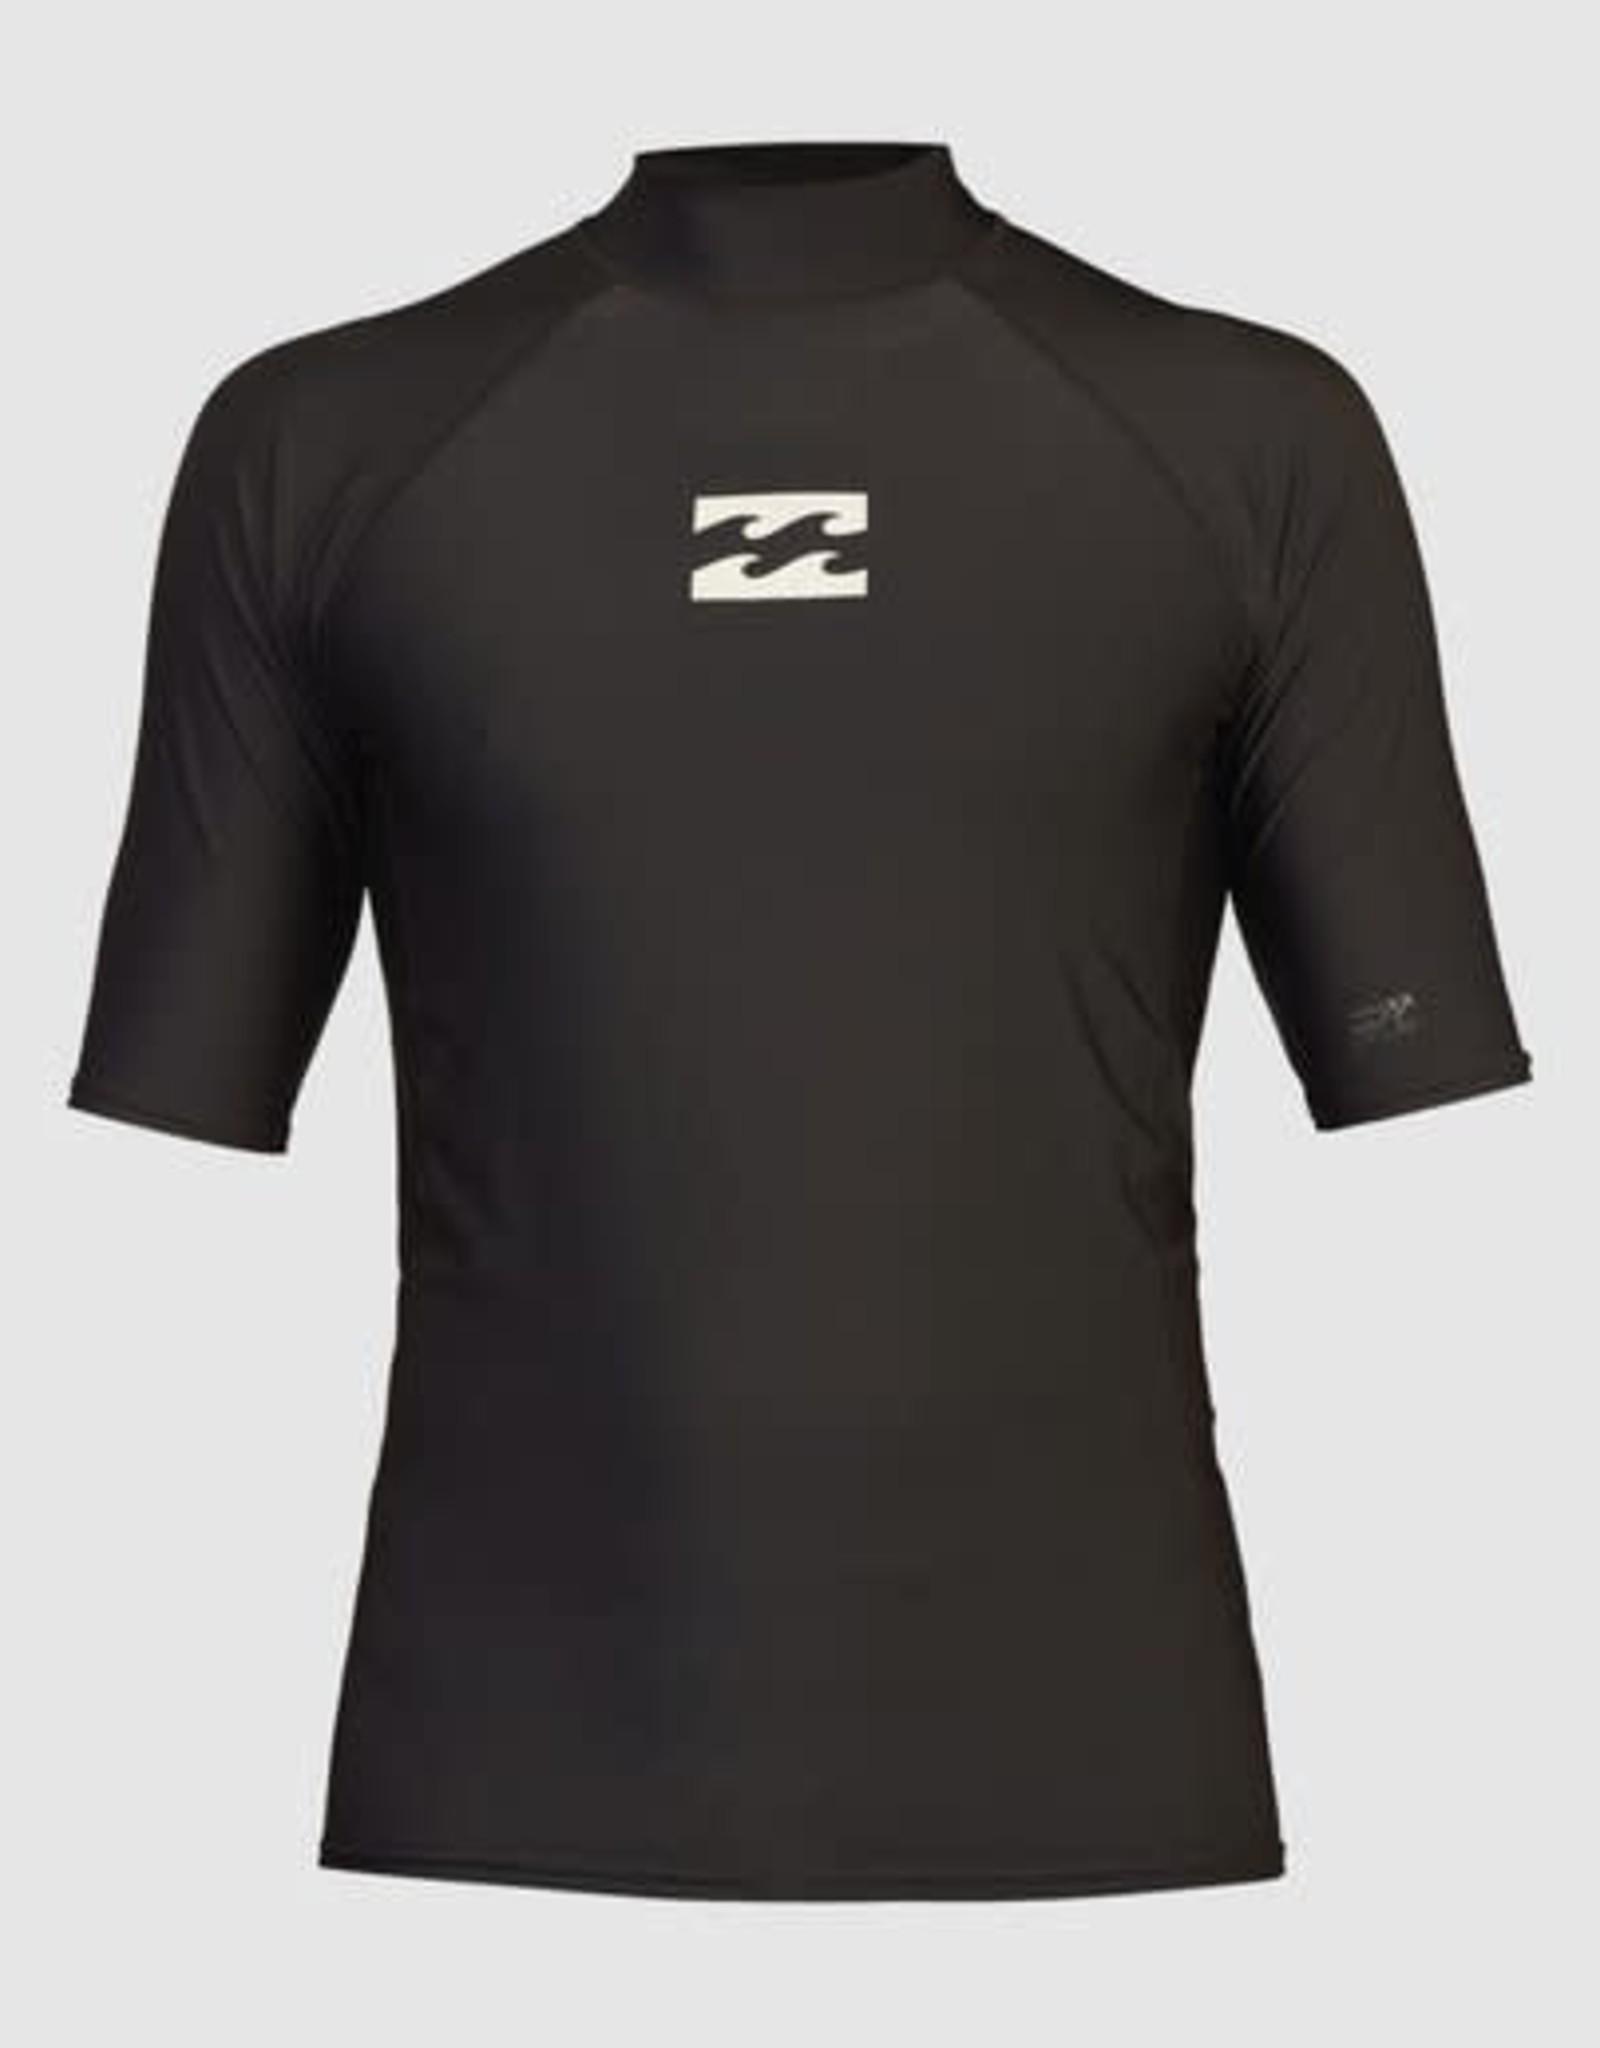 BILLABONG All Day Wave Performance Fit Short Sleeve Rashguard